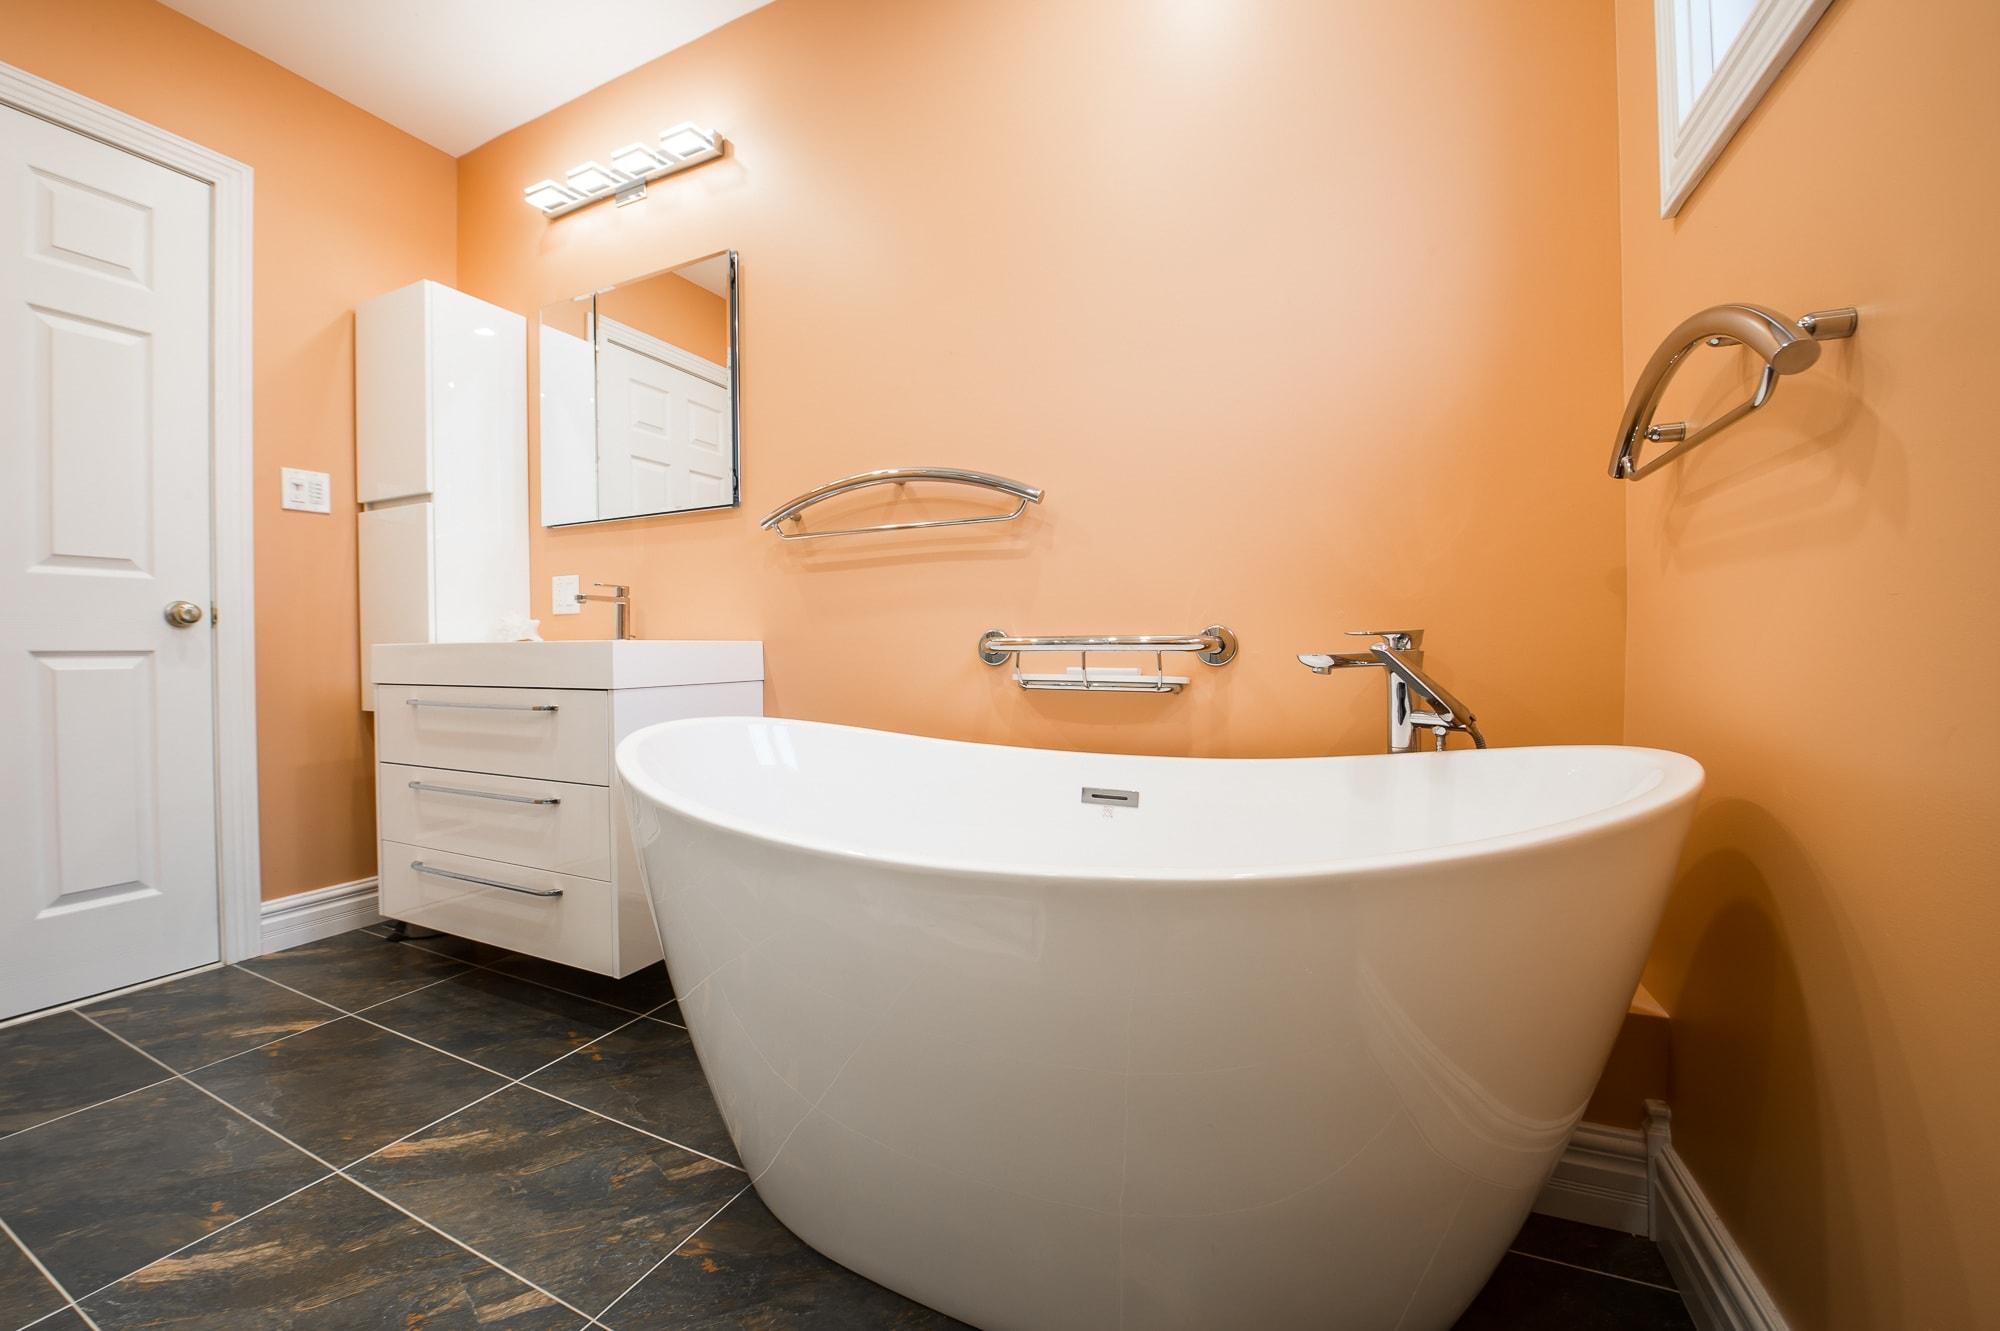 Bathroom with orange wall